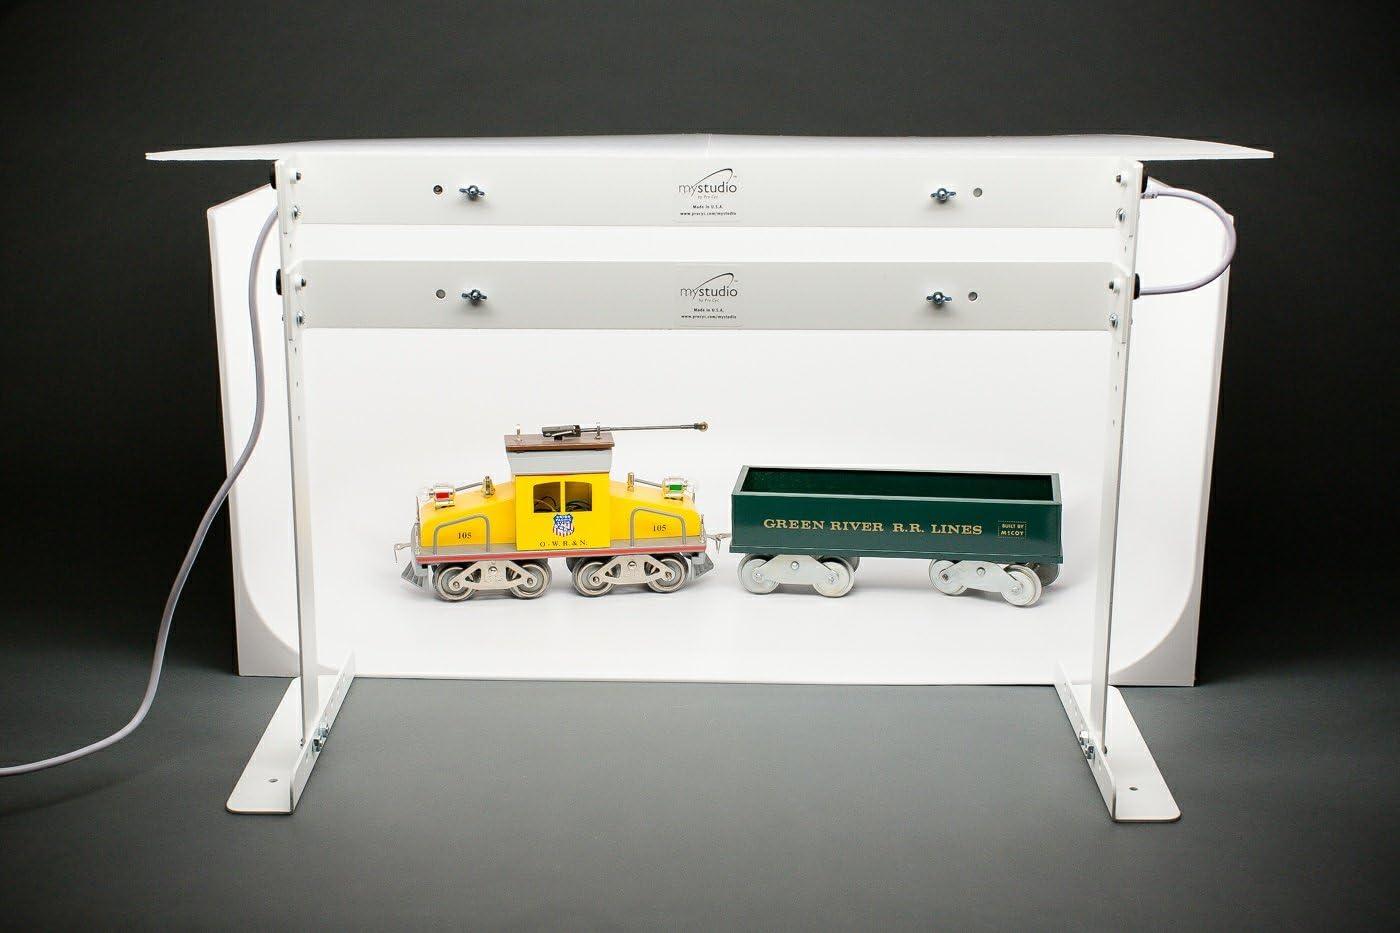 MyStudio MS20J Tabletop Photo Studio Lightbox with 5000K Lighting 12pc Jewelry Photography Tool Kit Bonus Tripod